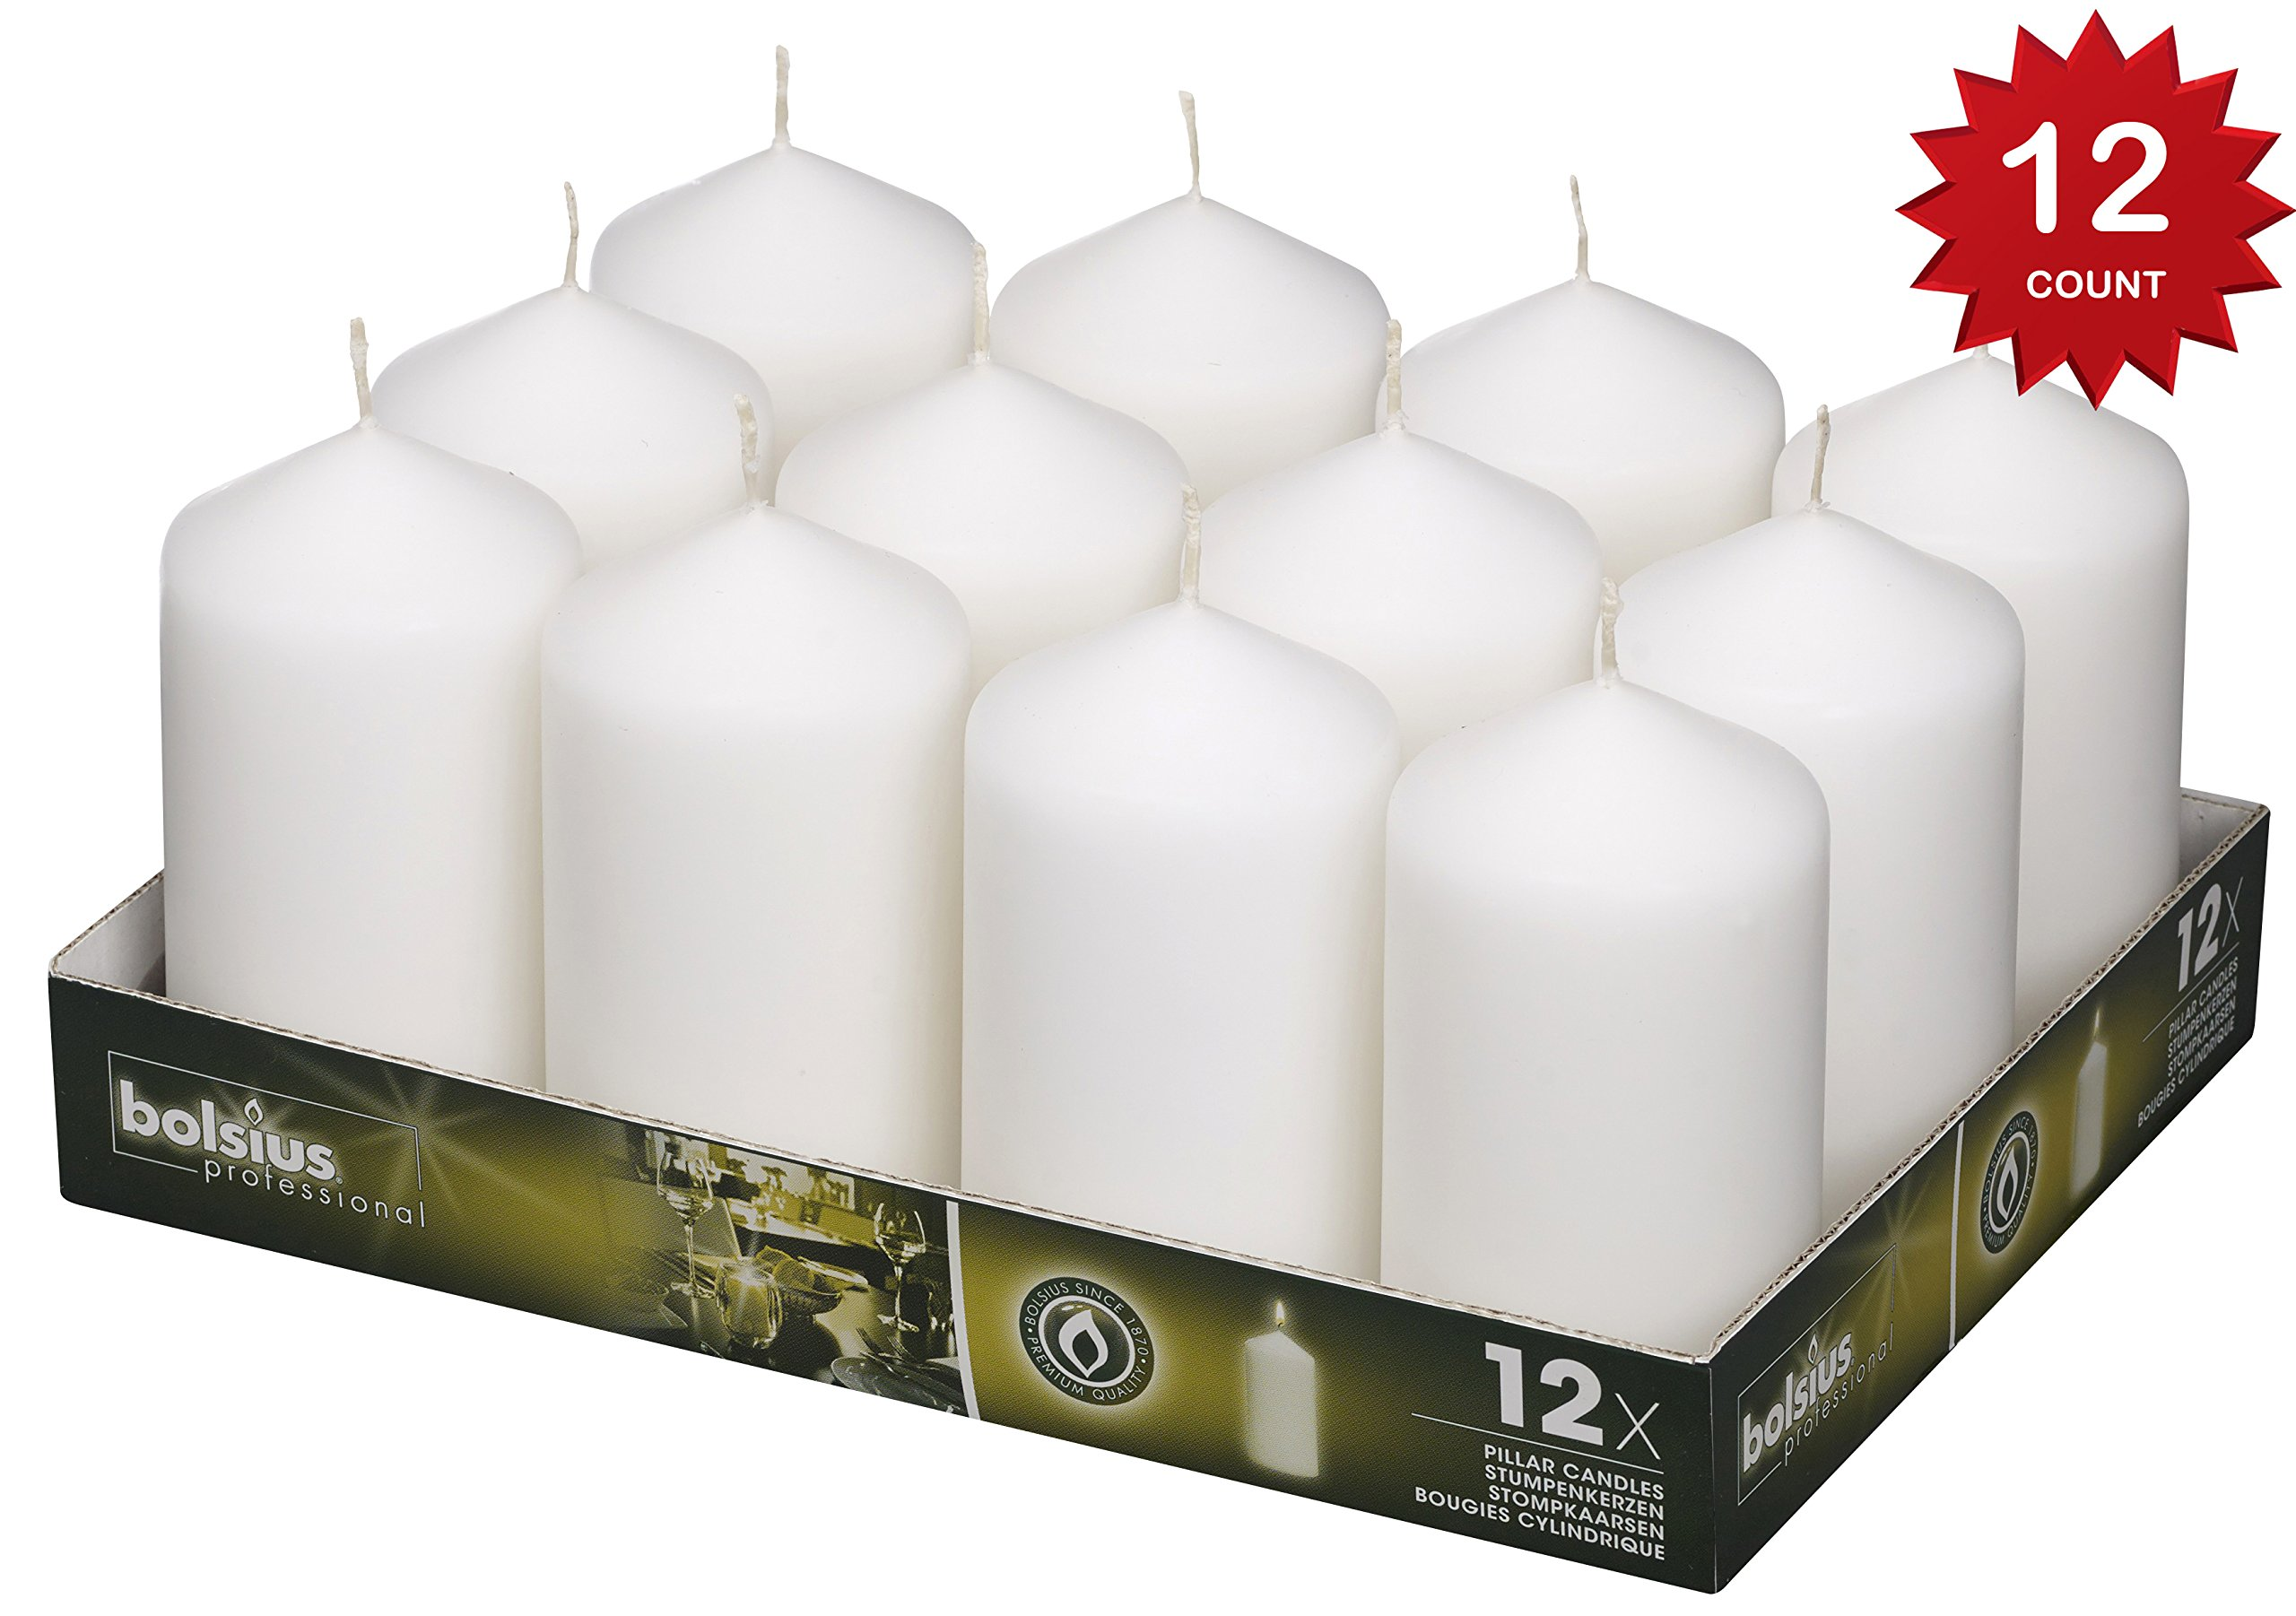 Bolsius Set Of Pillar Candles White 12Pk. 128 X 68mm (aprox 2.7x5 inch)